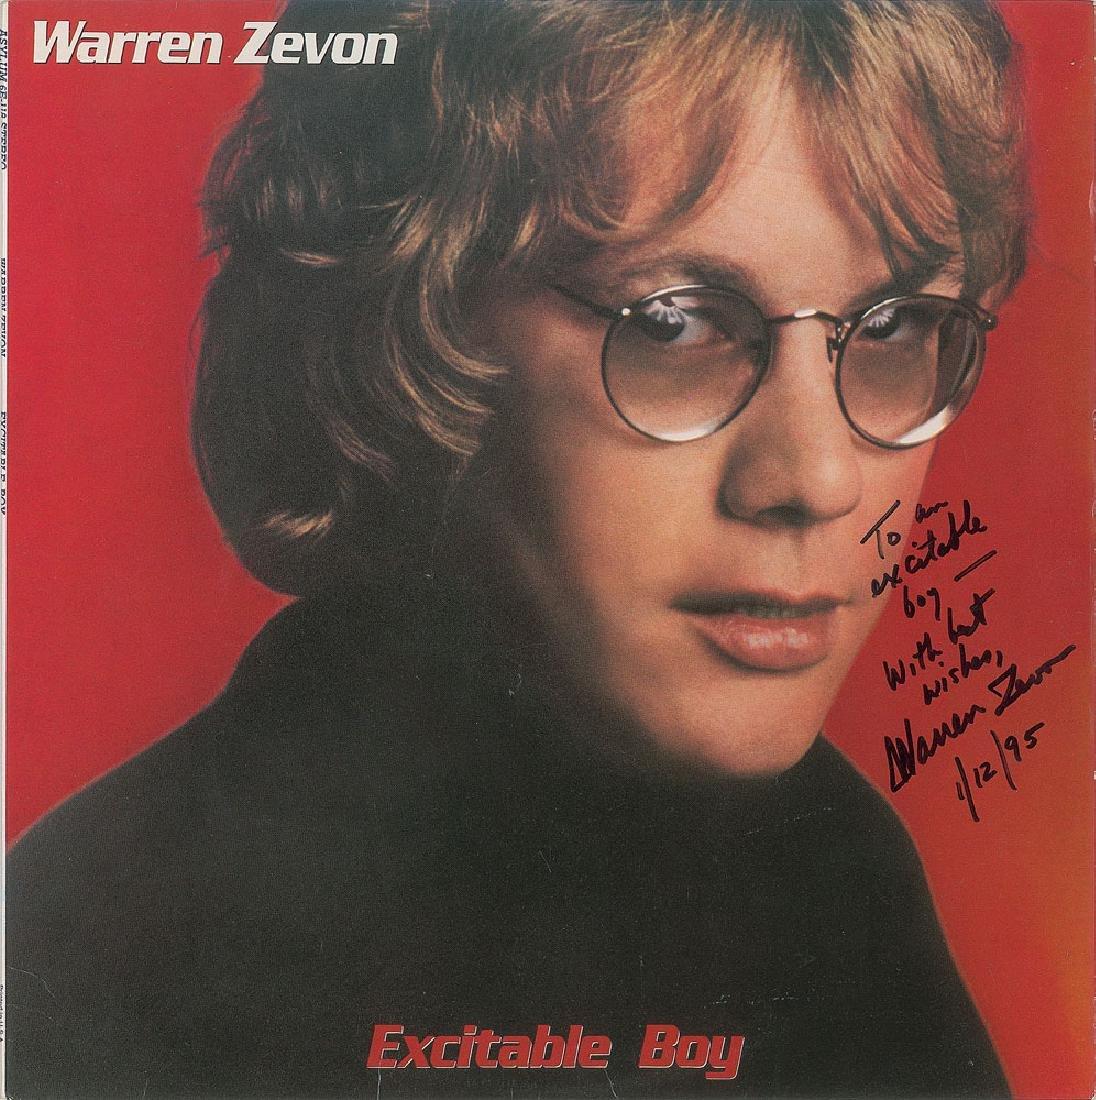 Warren Zevon Signed Album